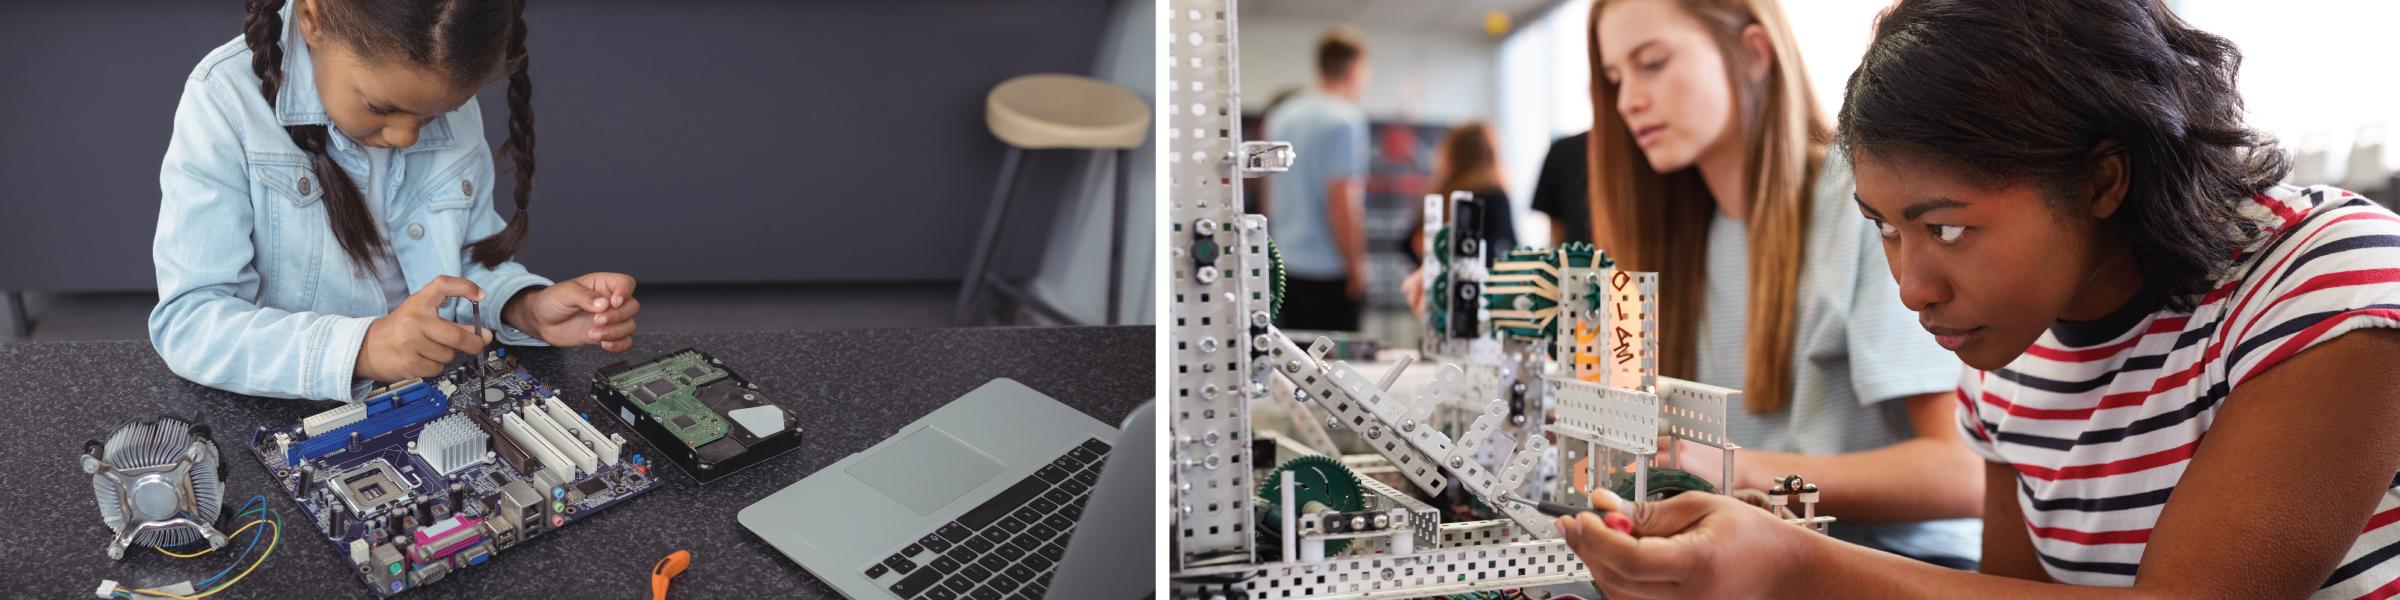 Female-Robotics-Engineering-Photos